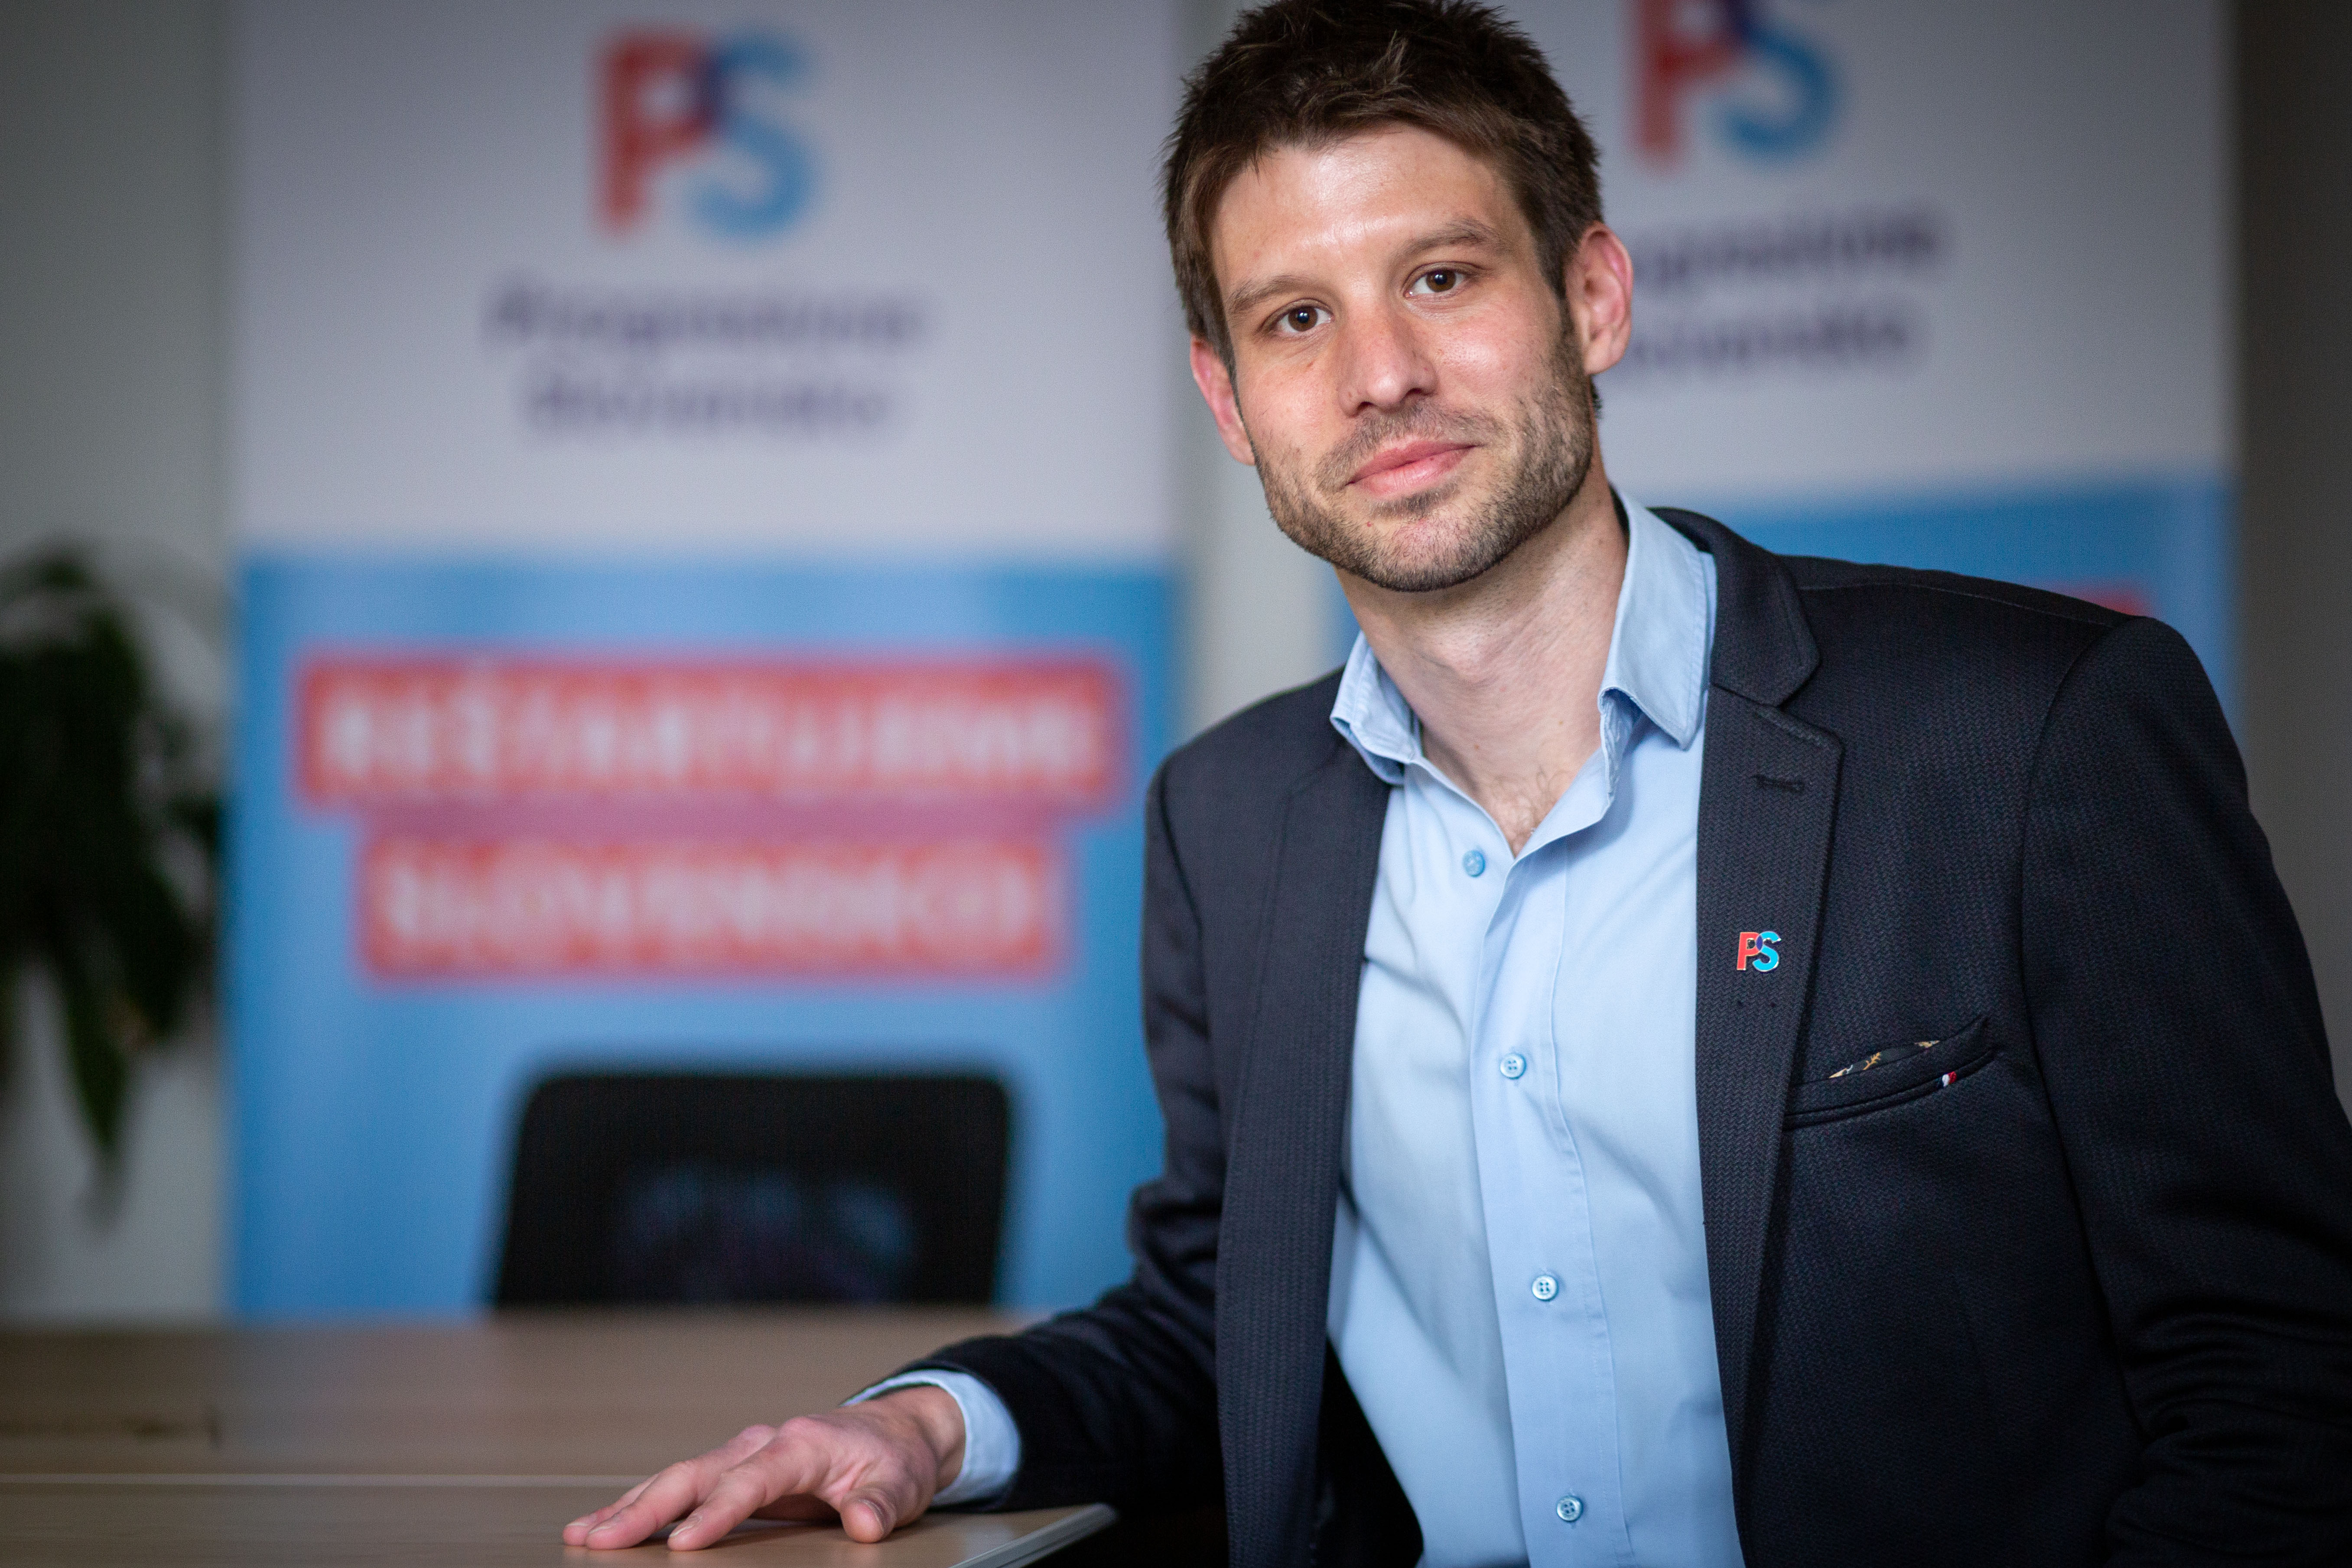 Michal Šimečka, a Progresszív Szlovákia-Spolu közös lista listavezetője. Fotó: Denník N, Tomáš Benedikovič